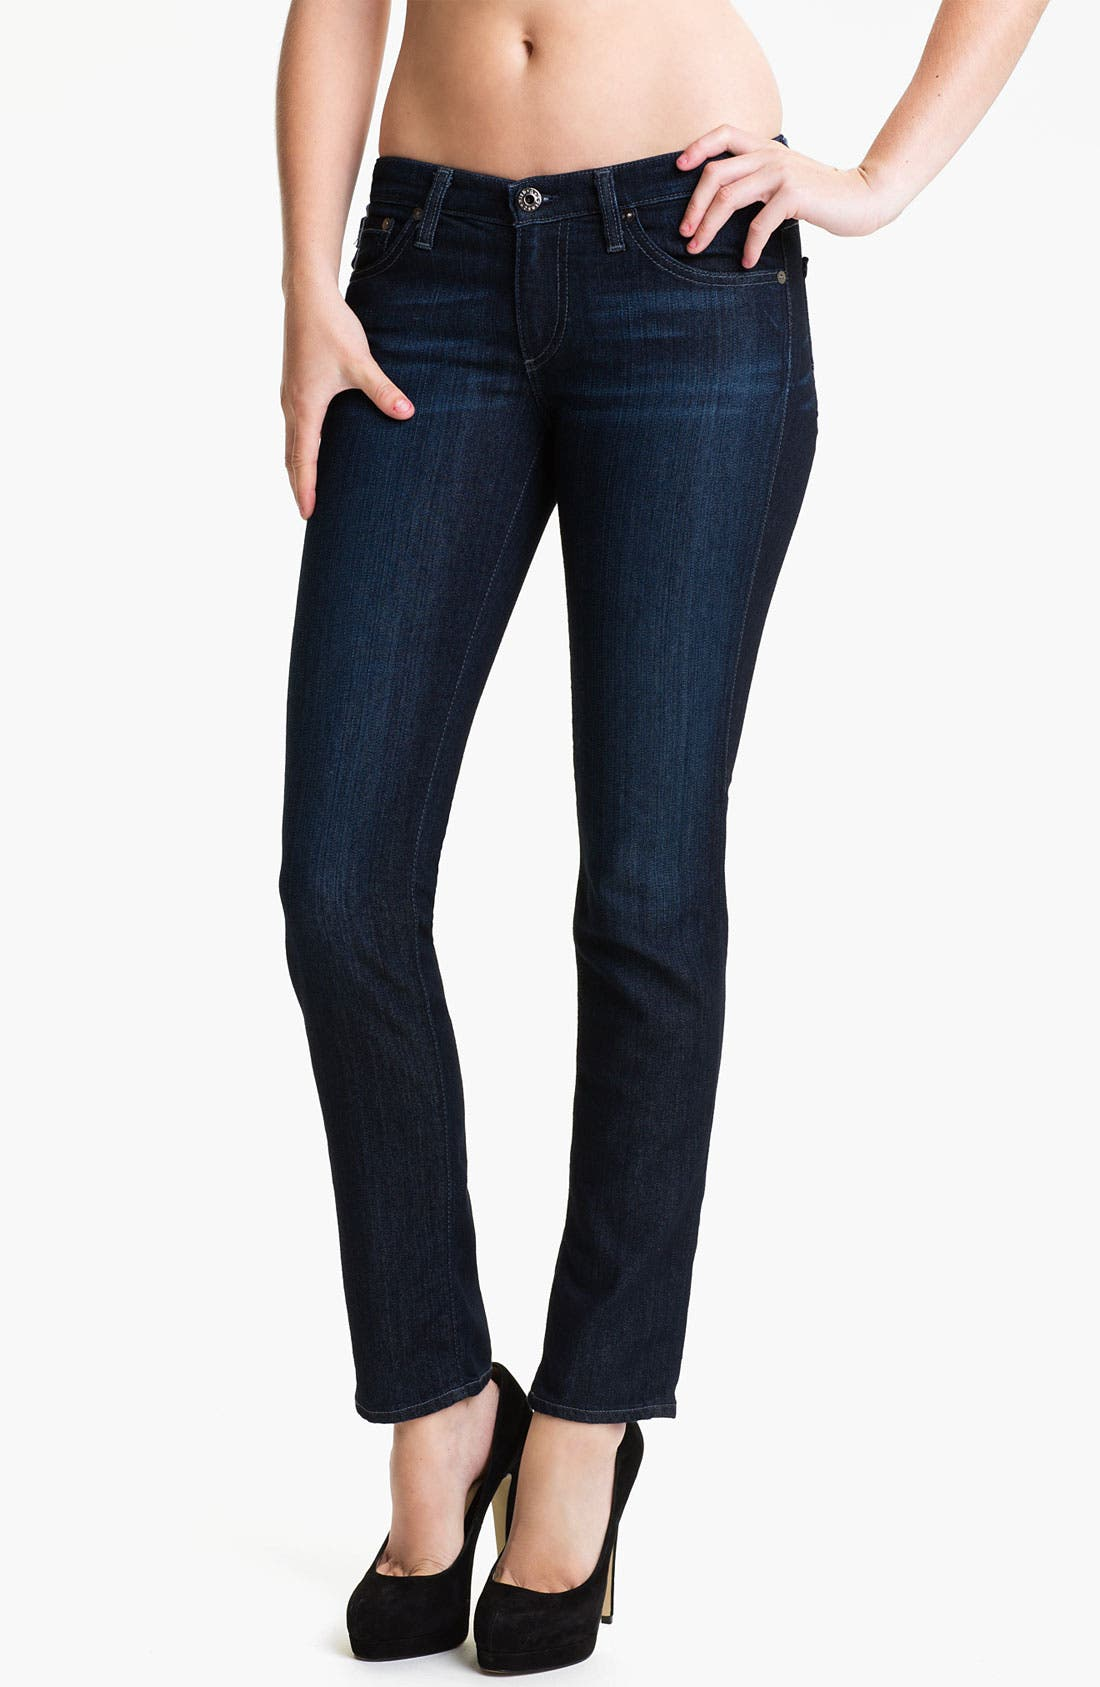 Alternate Image 1 Selected - AG Jeans 'Stilt' Skinny Jeans (Chandelier)